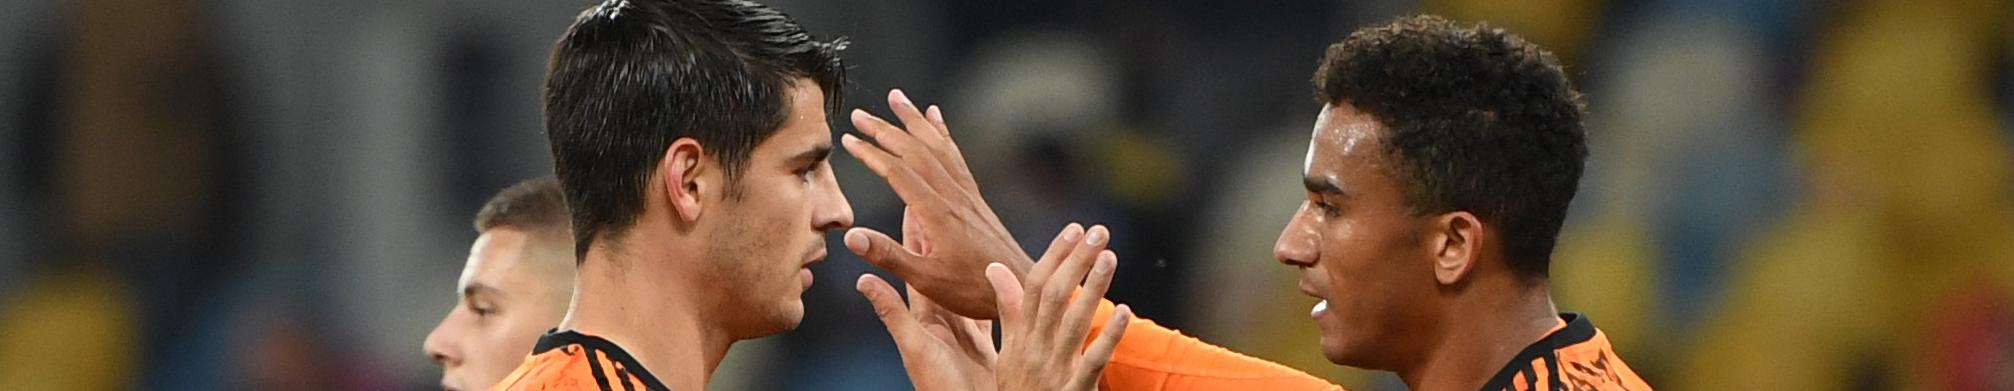 Juventus-Dinamo Kiev: Morata guida l'attacco, torna CR7